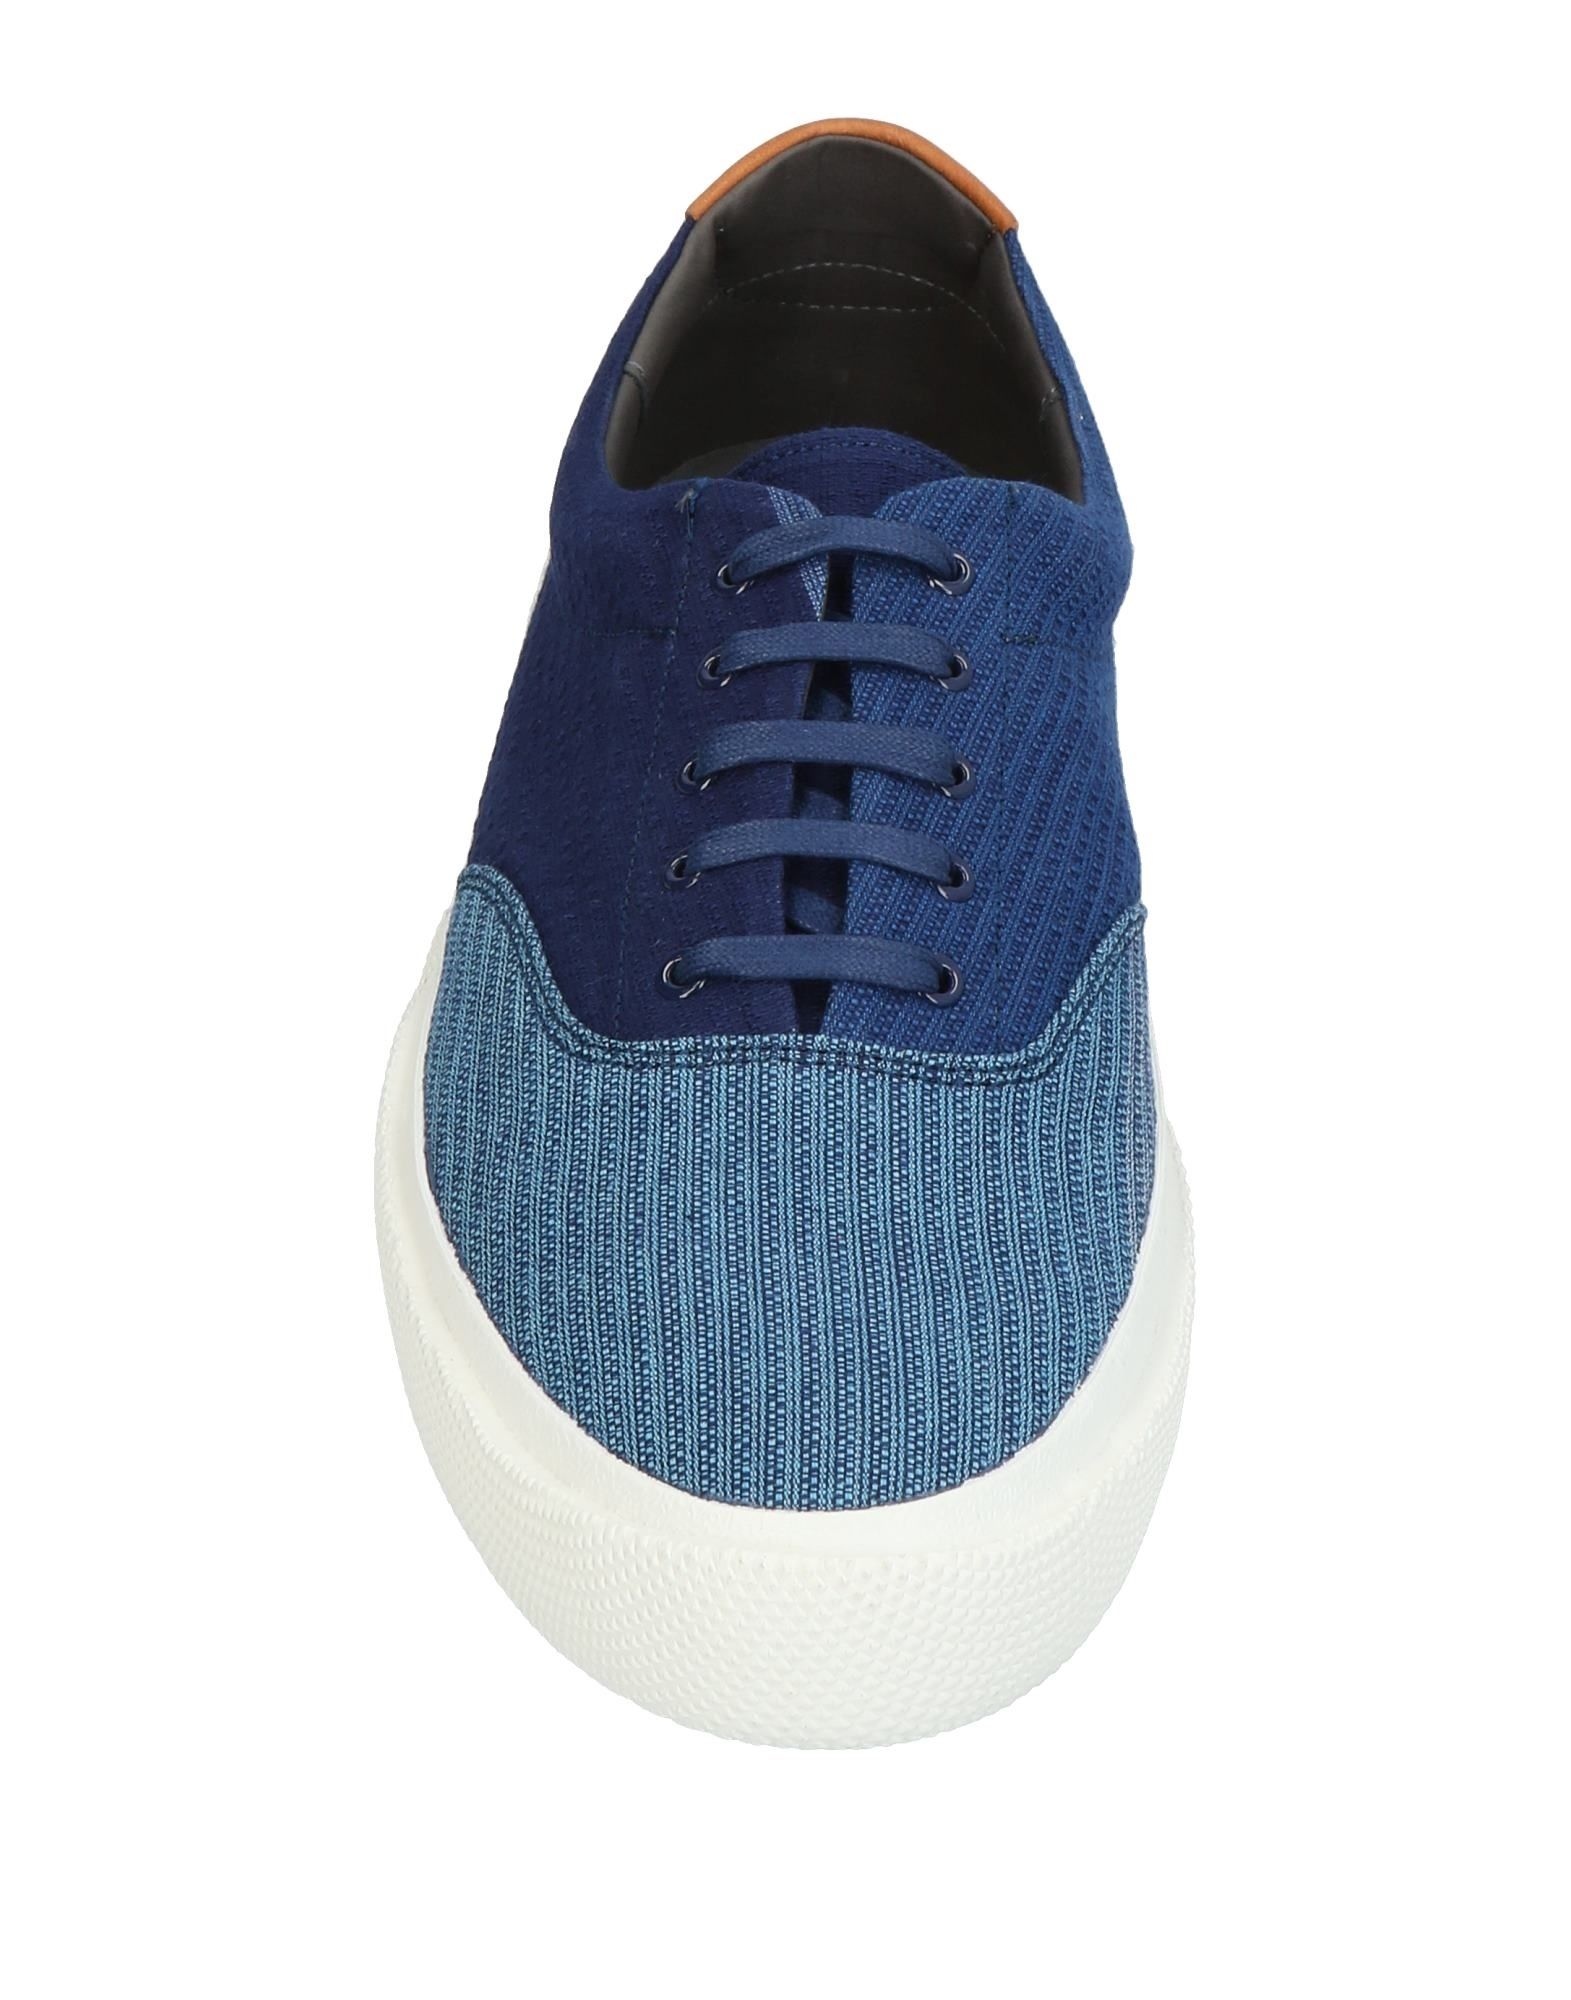 Rabatt echte Schuhe Spingle Move W Sneakers  Herren  Sneakers 11440253XK a8e66c